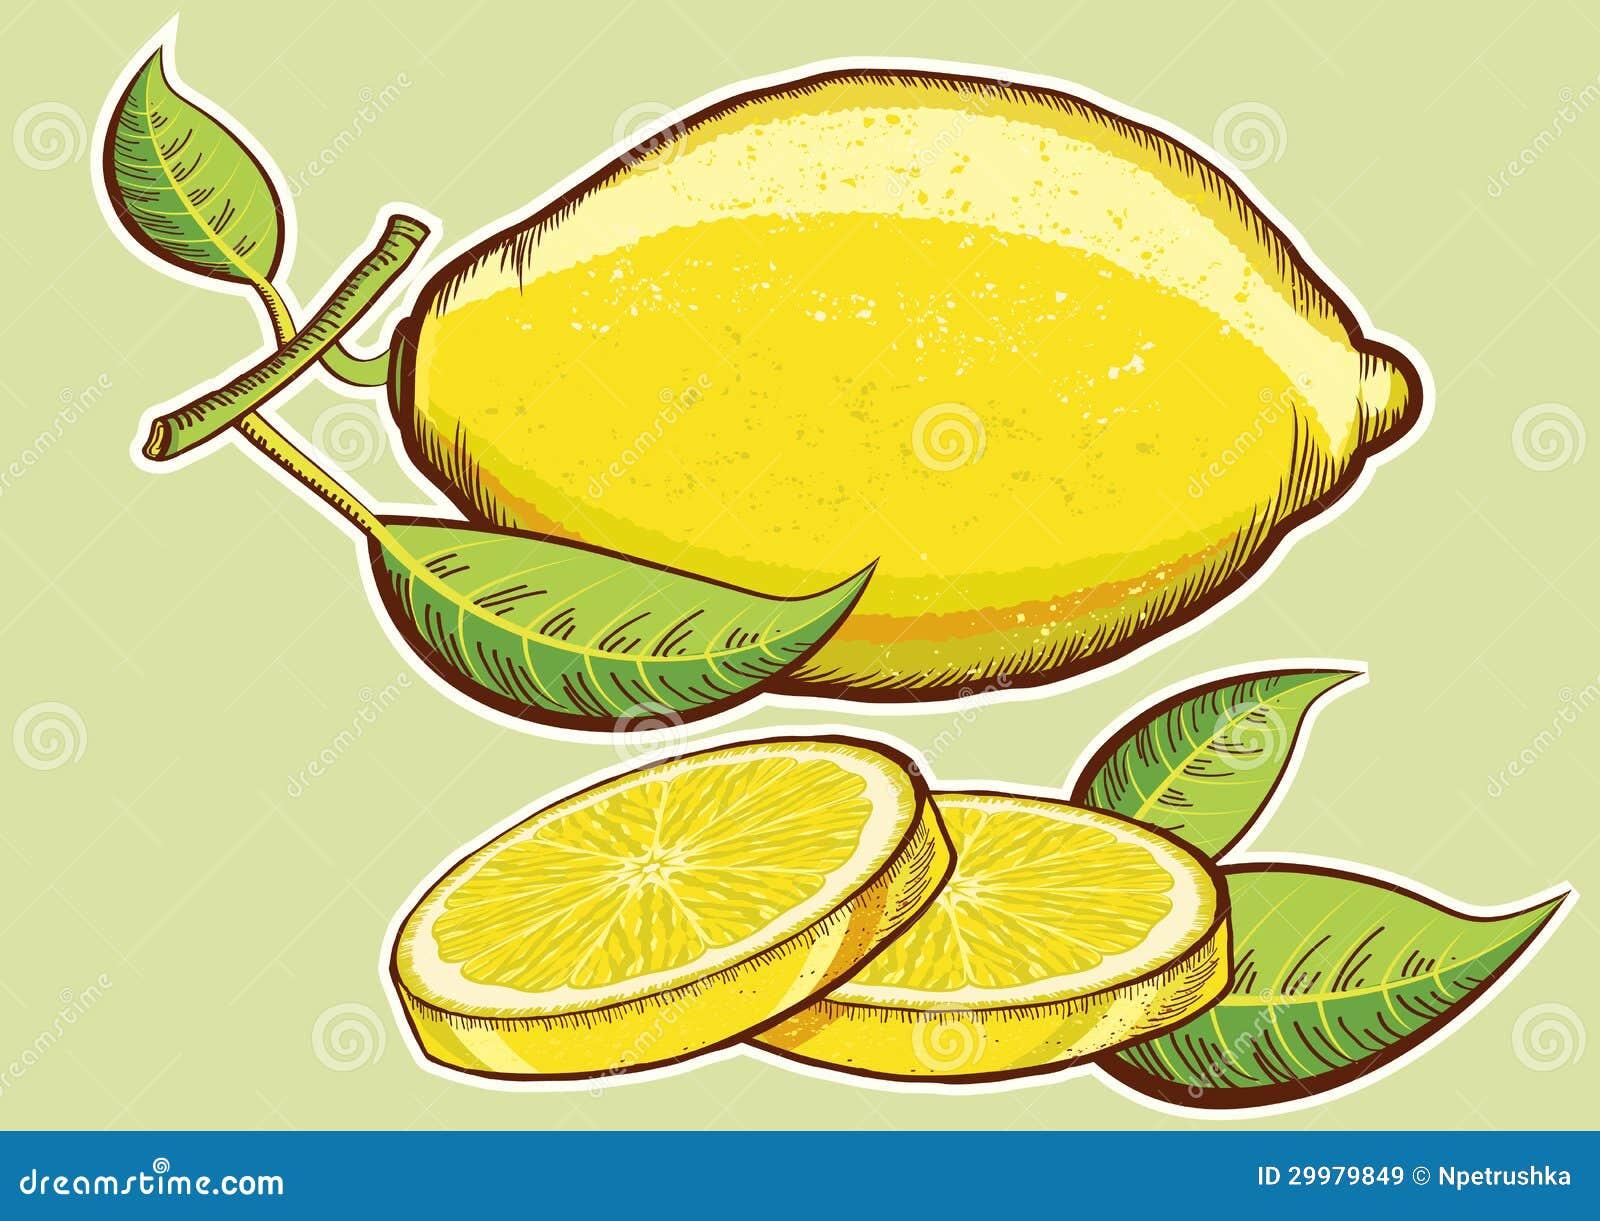 Limoni Disegno: Limoni Freschi Gialli Con Le Foglie Verdi Isolate